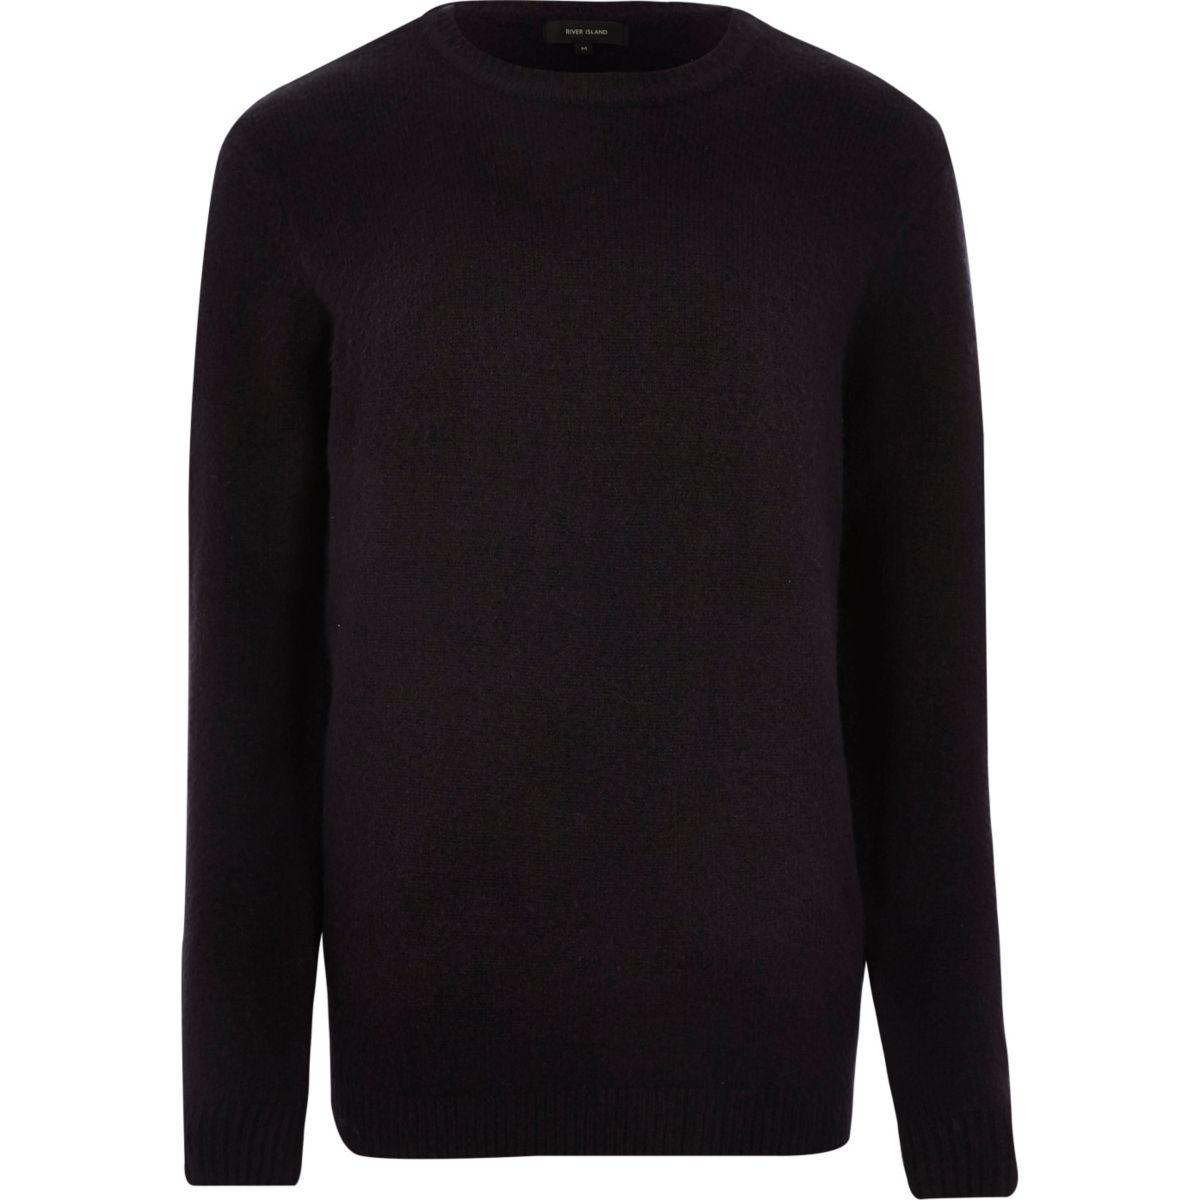 Navy soft crew neck knit jumper